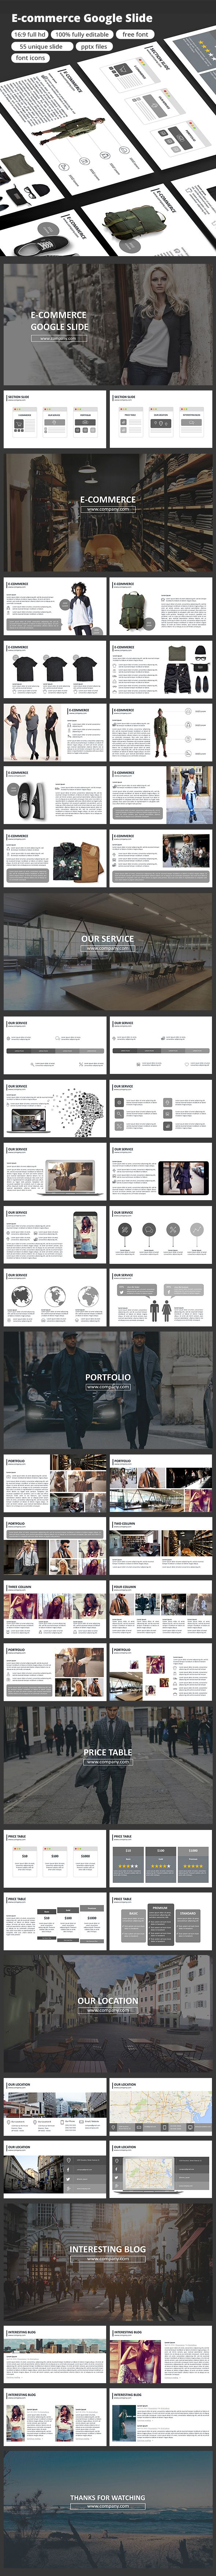 E-commerce - google slide - Google Slides Presentation Templates